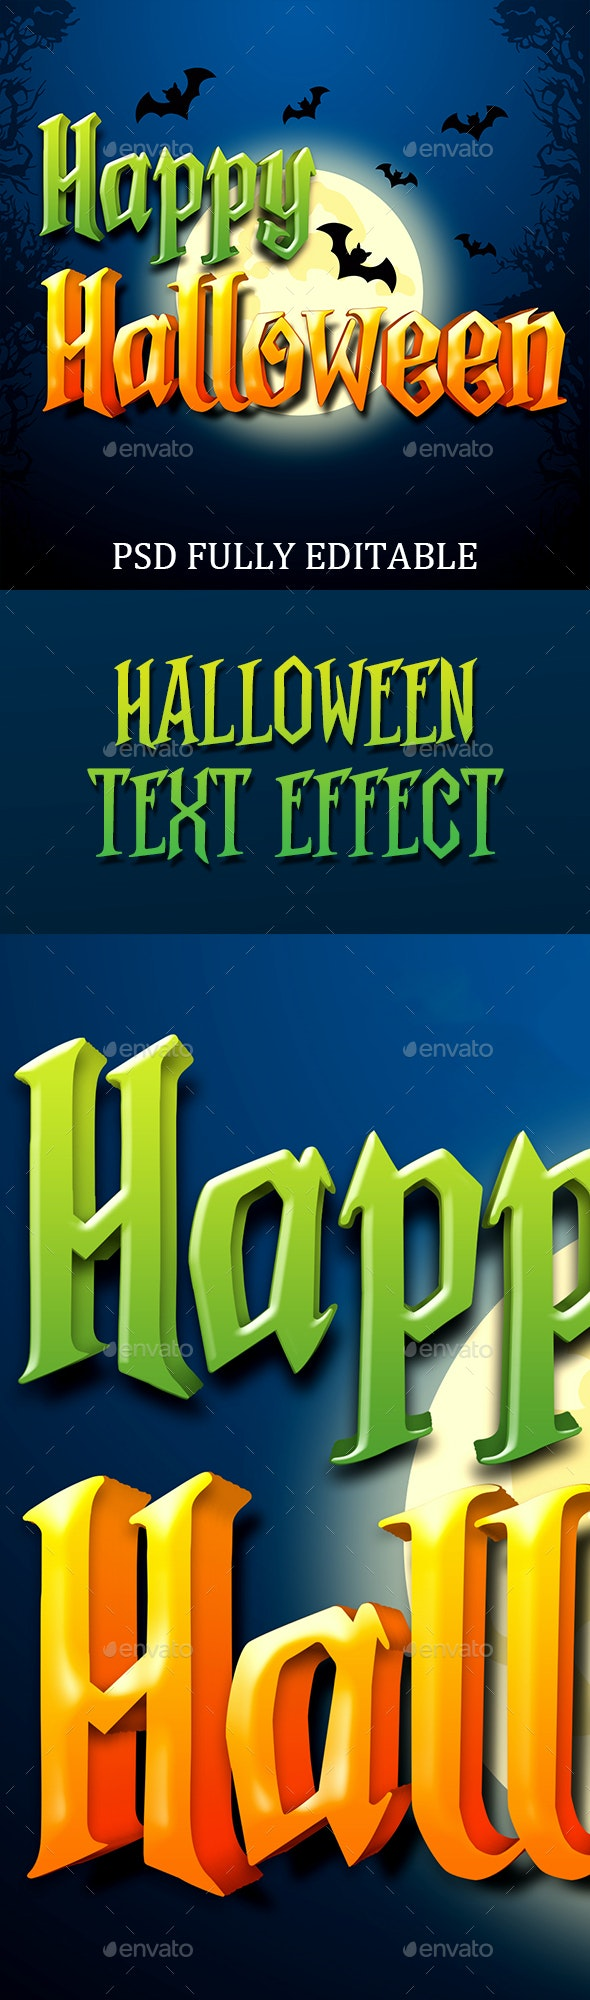 Halloween Text Effects - Text 3D Renders